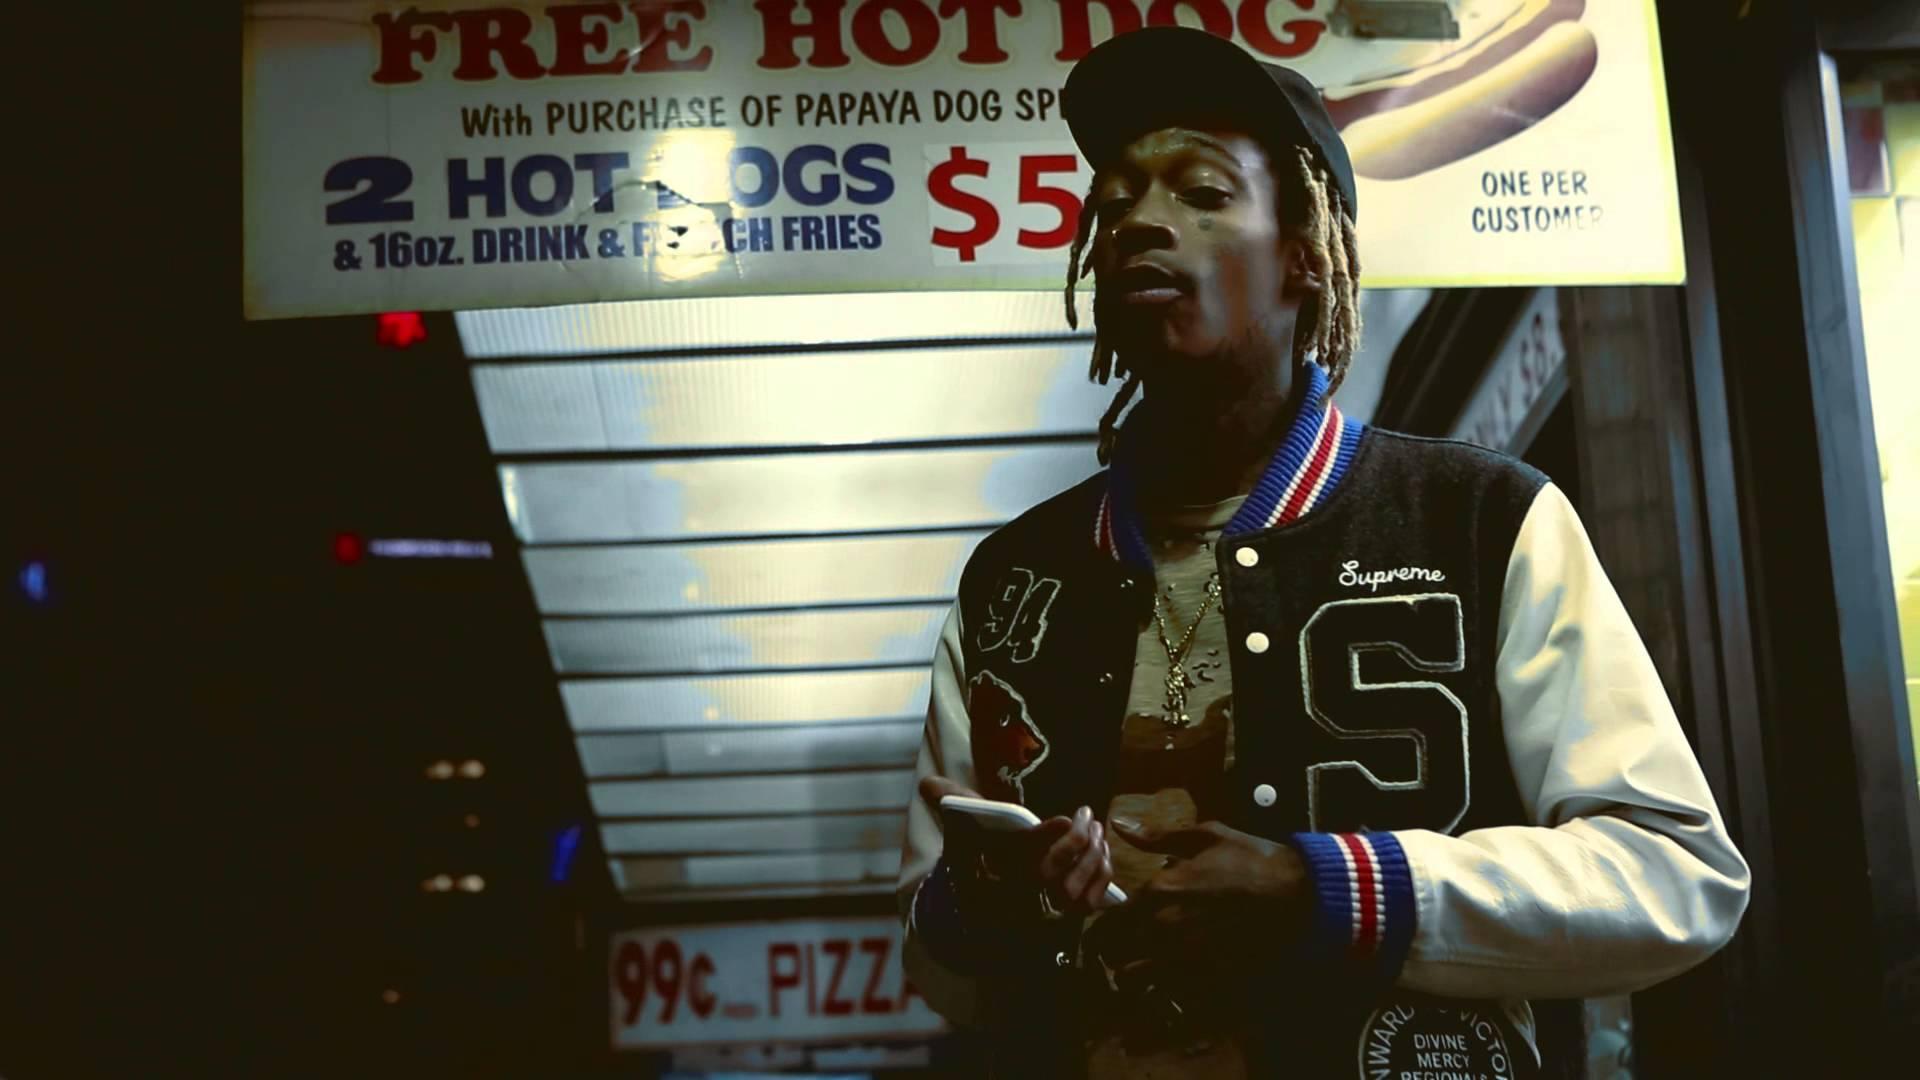 Wiz Khalifa – Good For Us